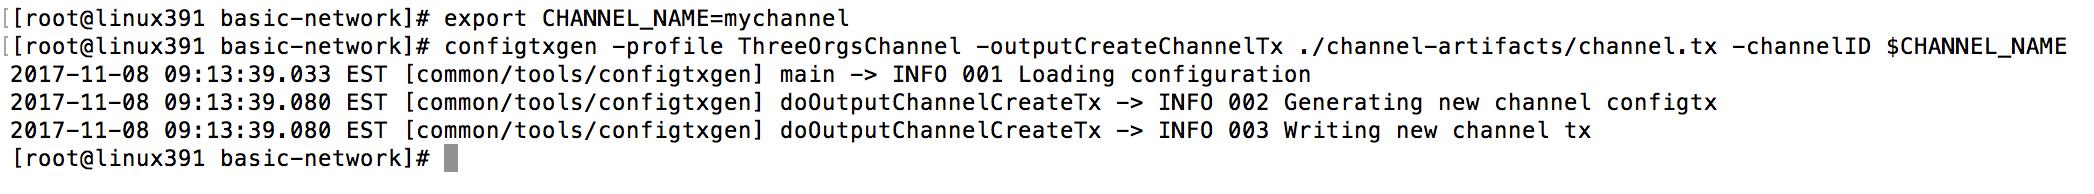 generate channel configuration transaction